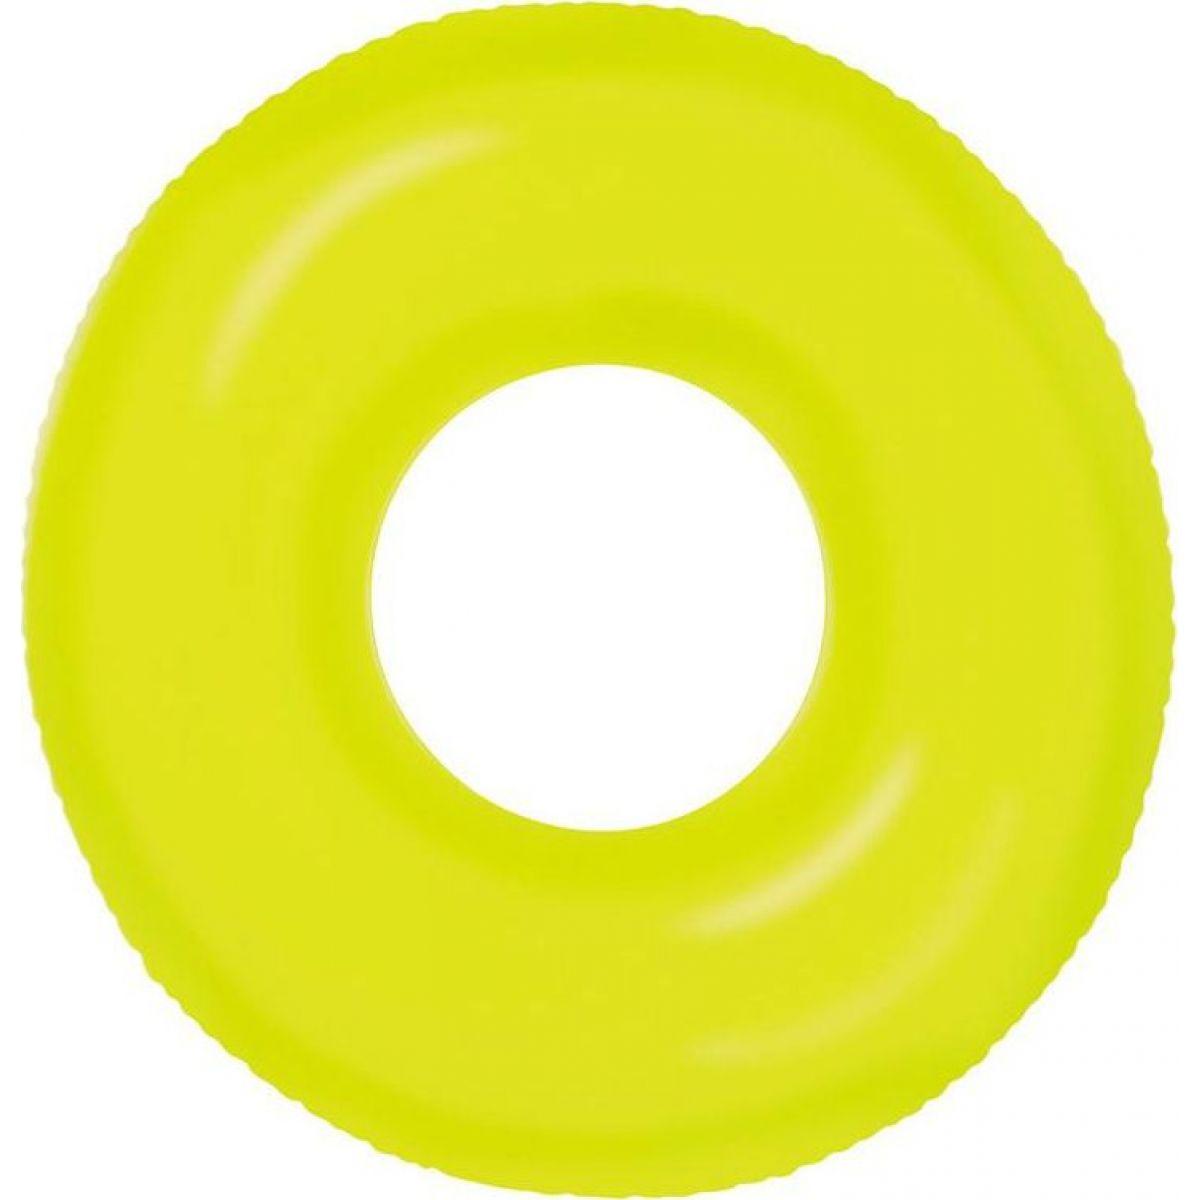 Levně Intex 59262 Plavací kruh 91cm Neon Frost Žlutá